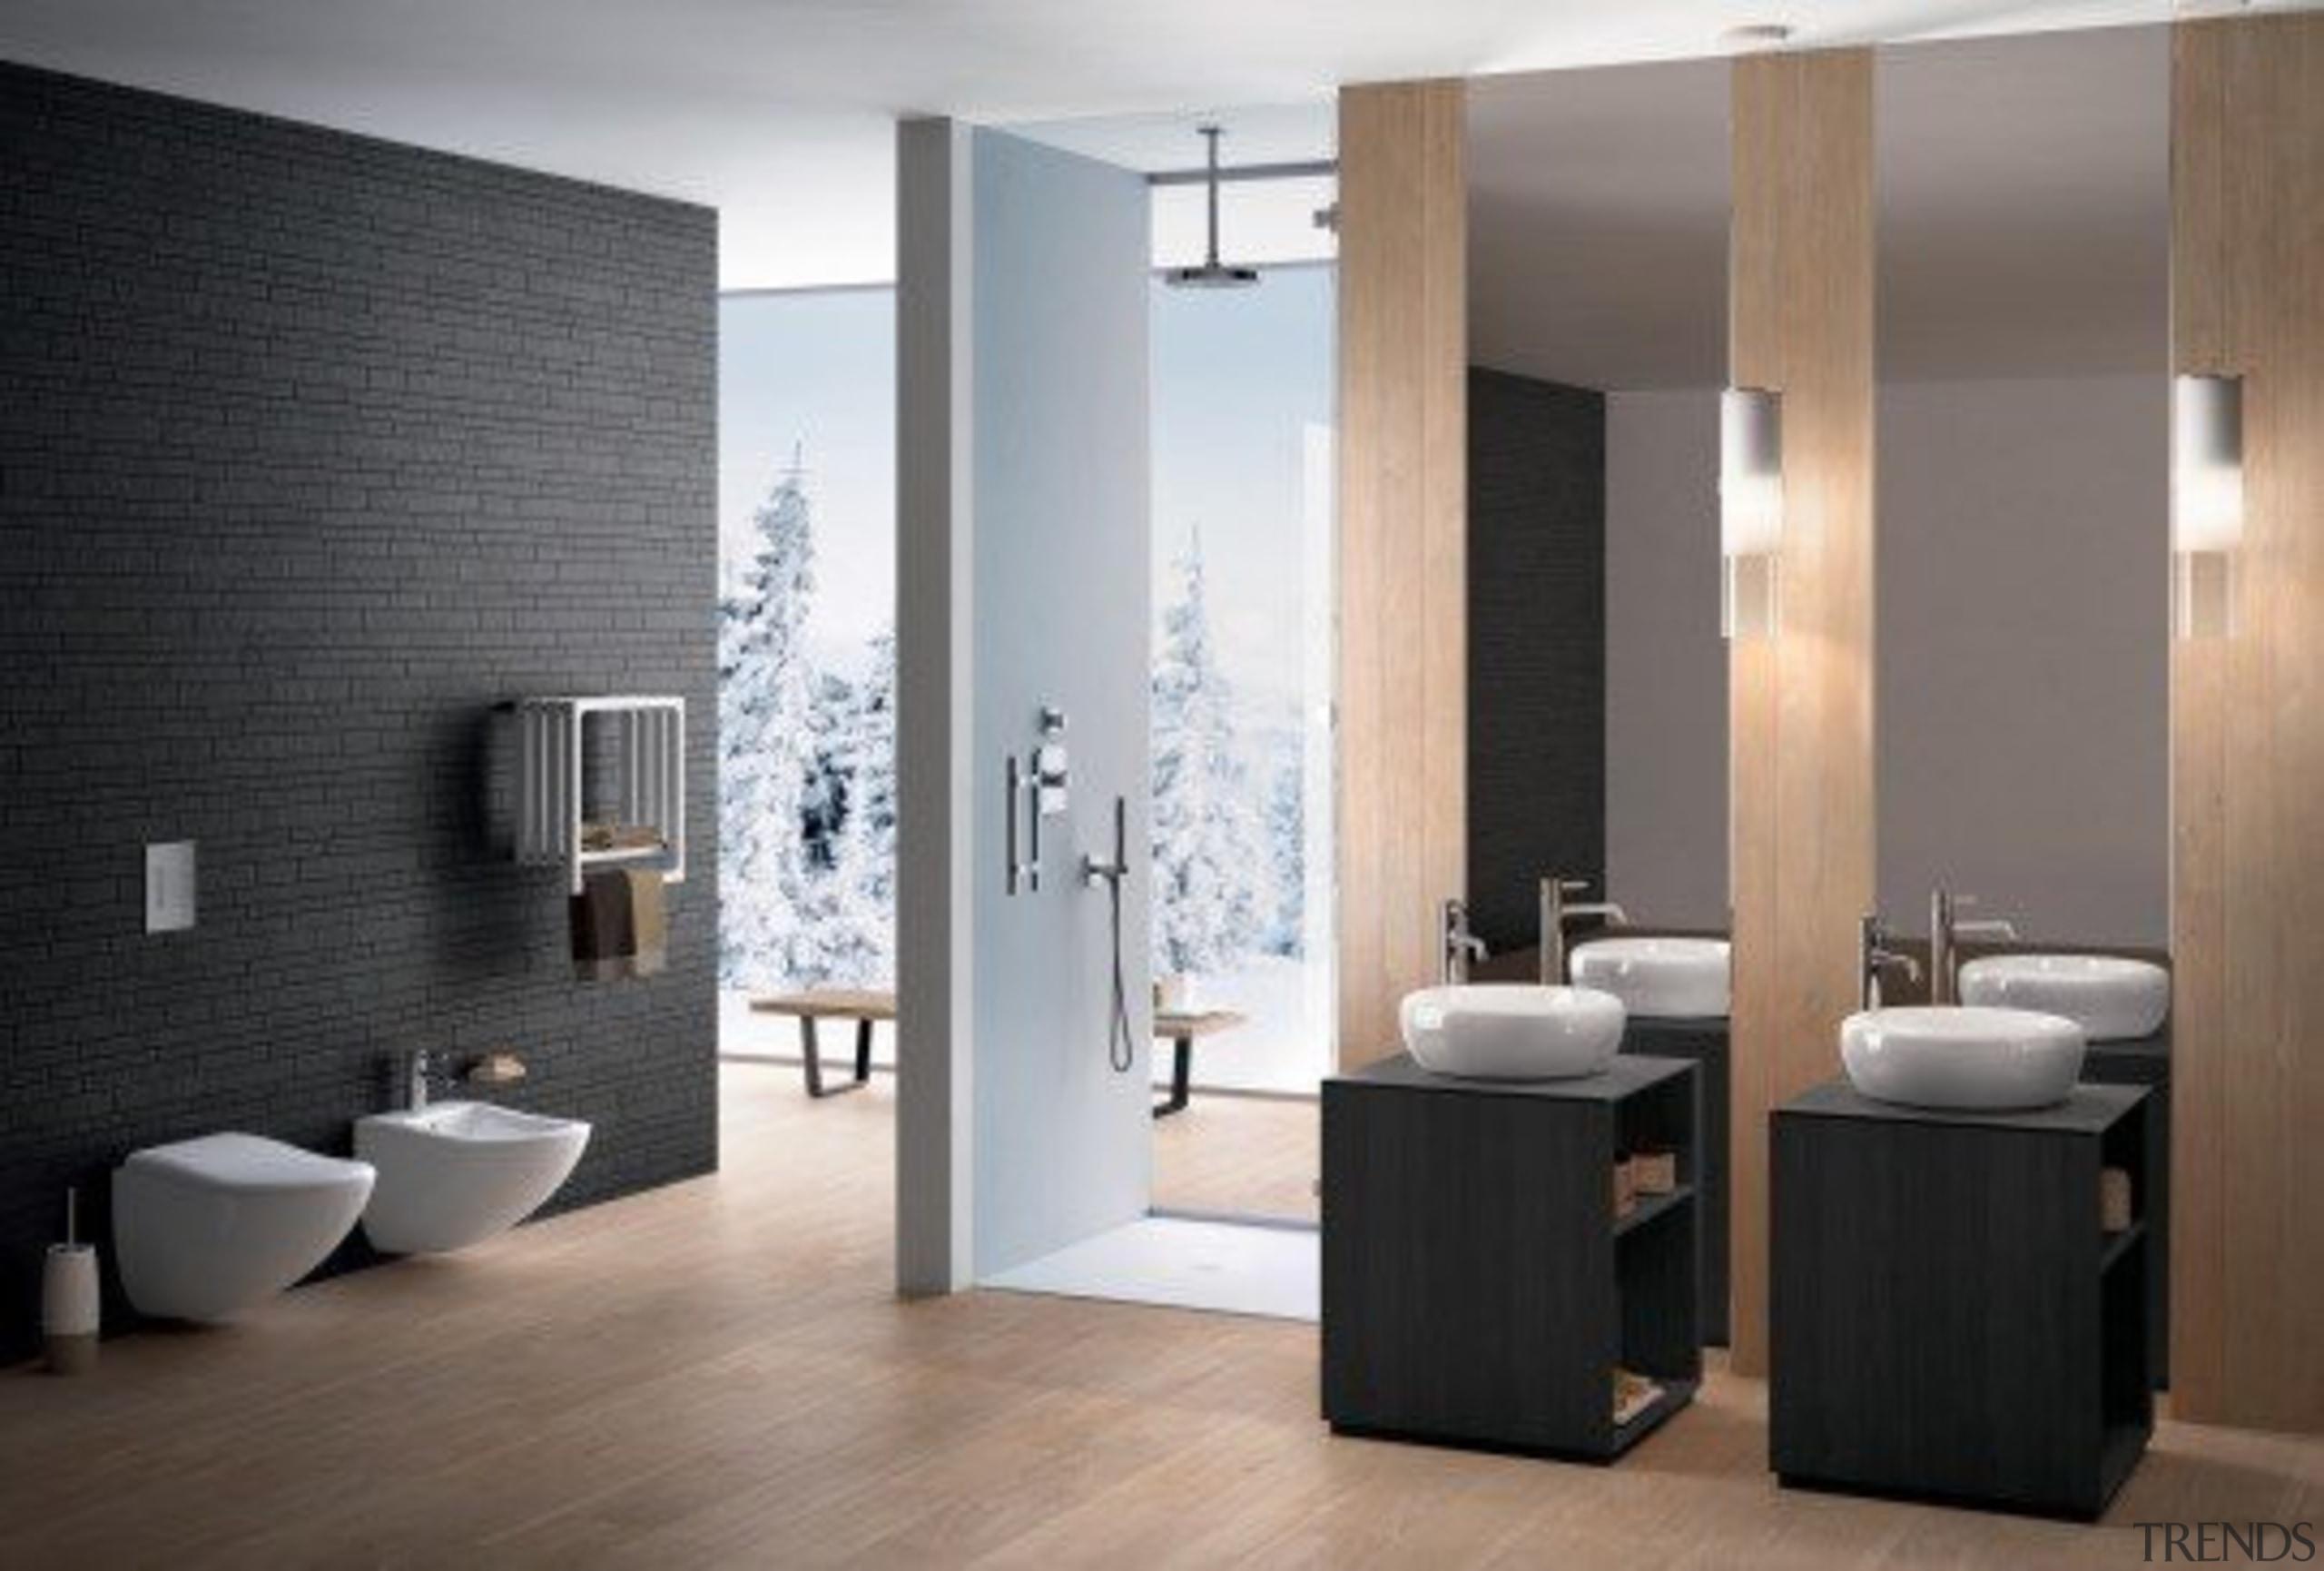 Fluid Ambiente - Fluid Ambiente - bathroom | bathroom, bathroom accessory, bathroom cabinet, floor, flooring, interior design, plumbing fixture, product design, room, tile, gray, black